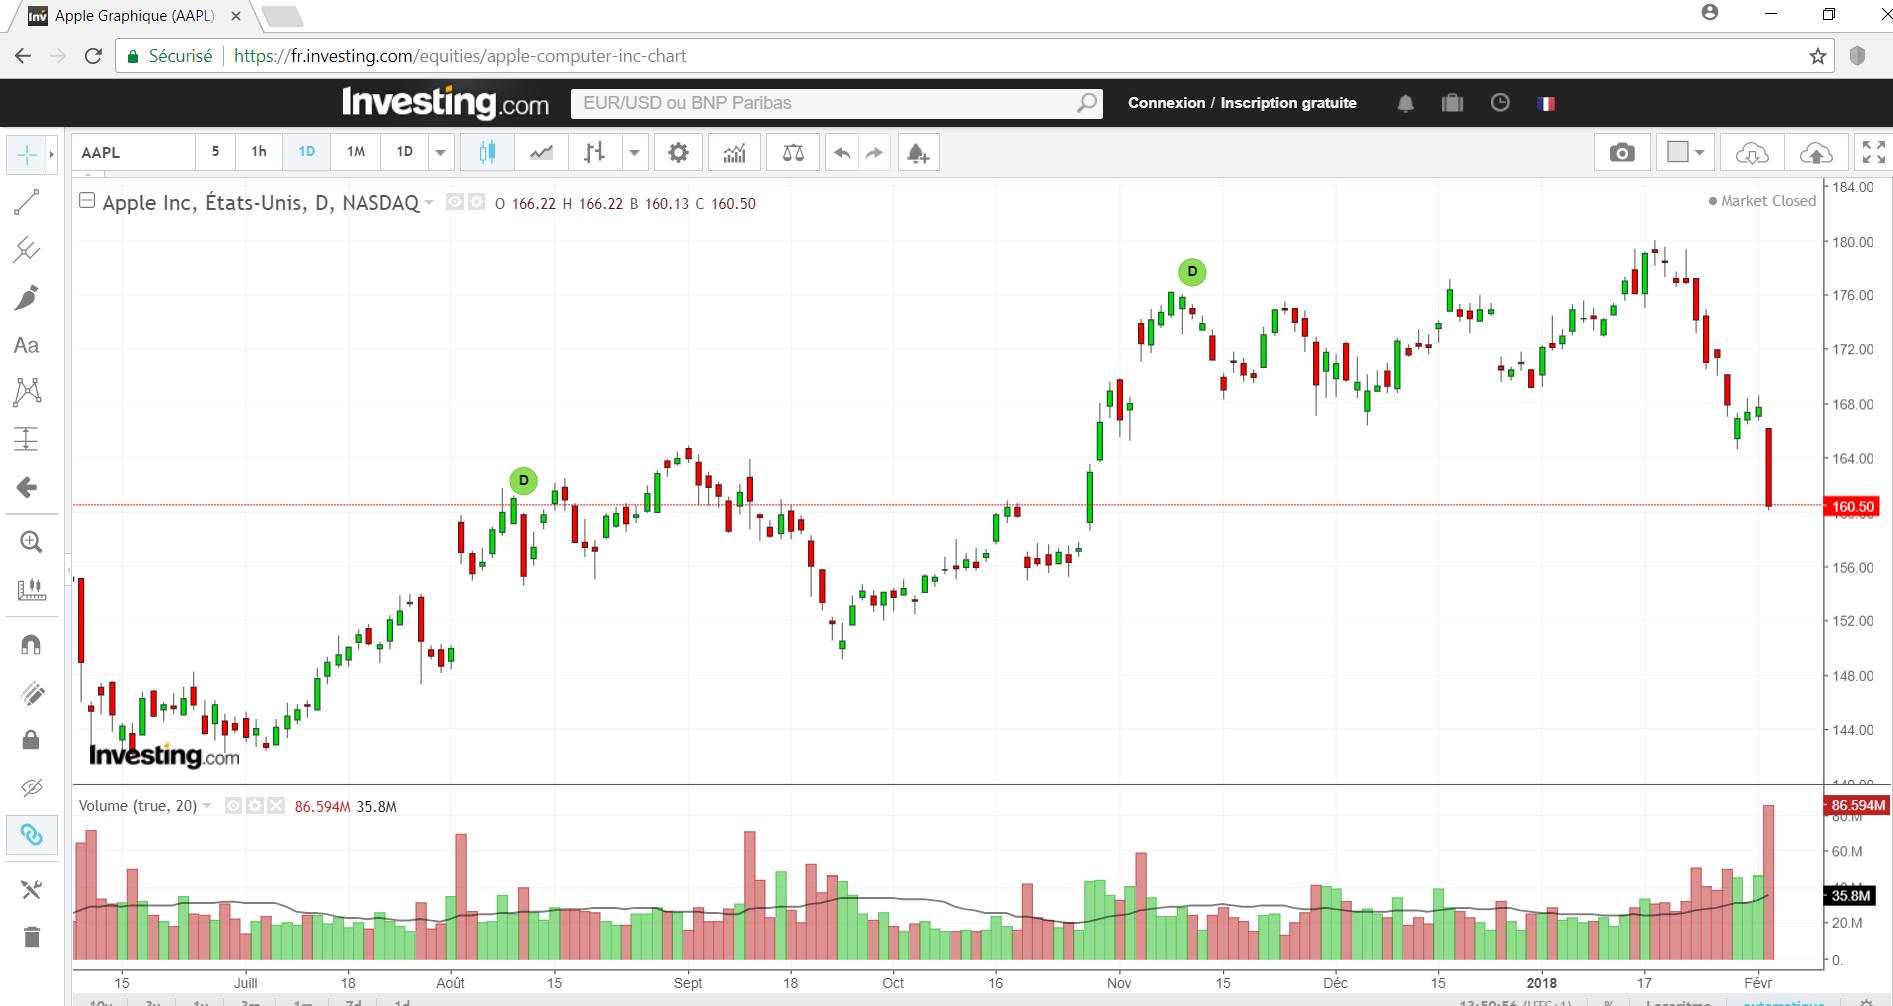 logiciel trading gratuit bourse investing